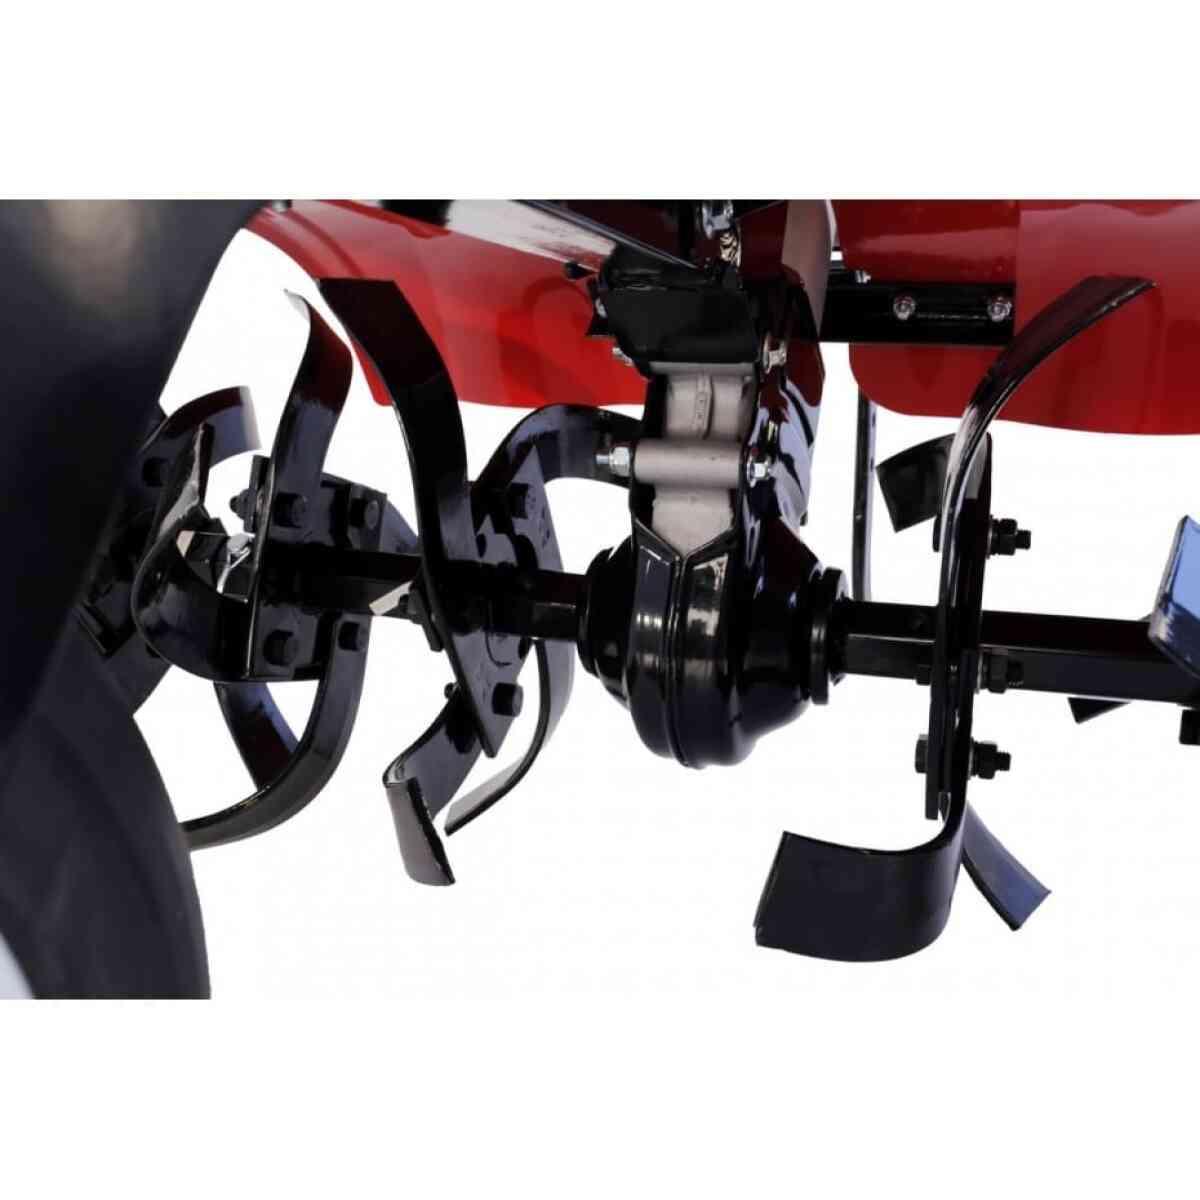 motocultor loncin lc750 7cp o mac.ro 4 57